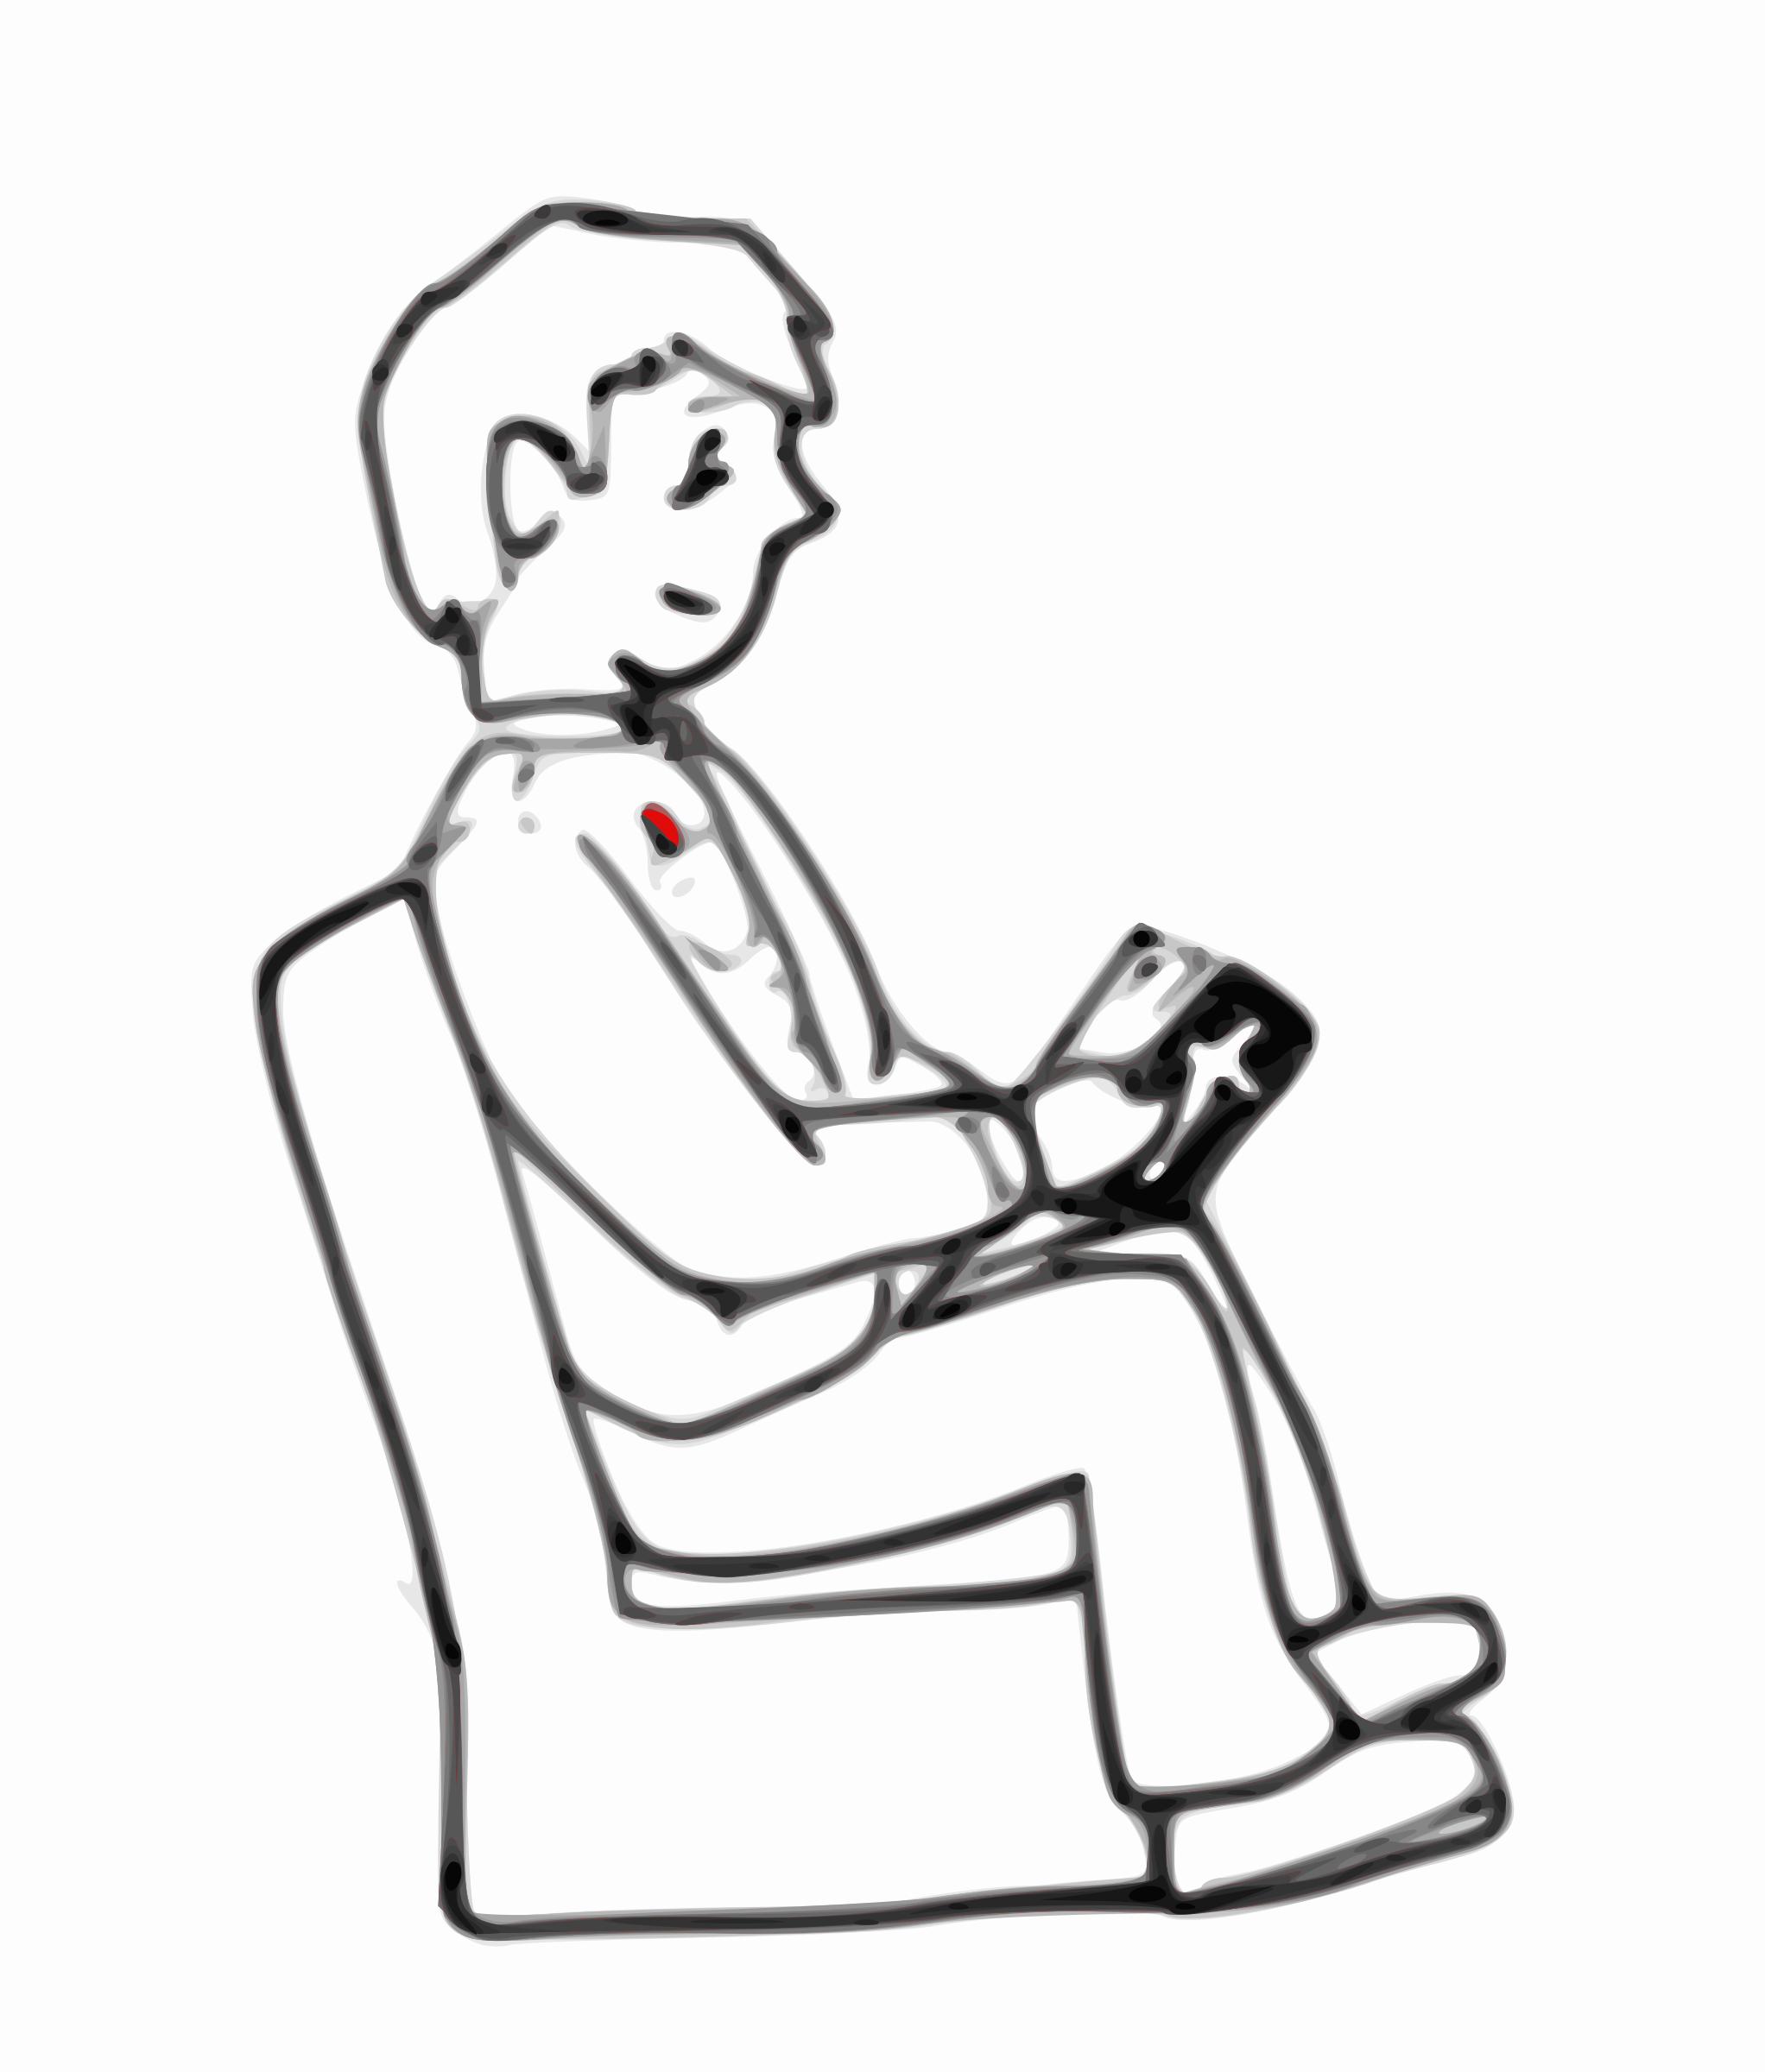 Sit clipart black and white. Gclipart com